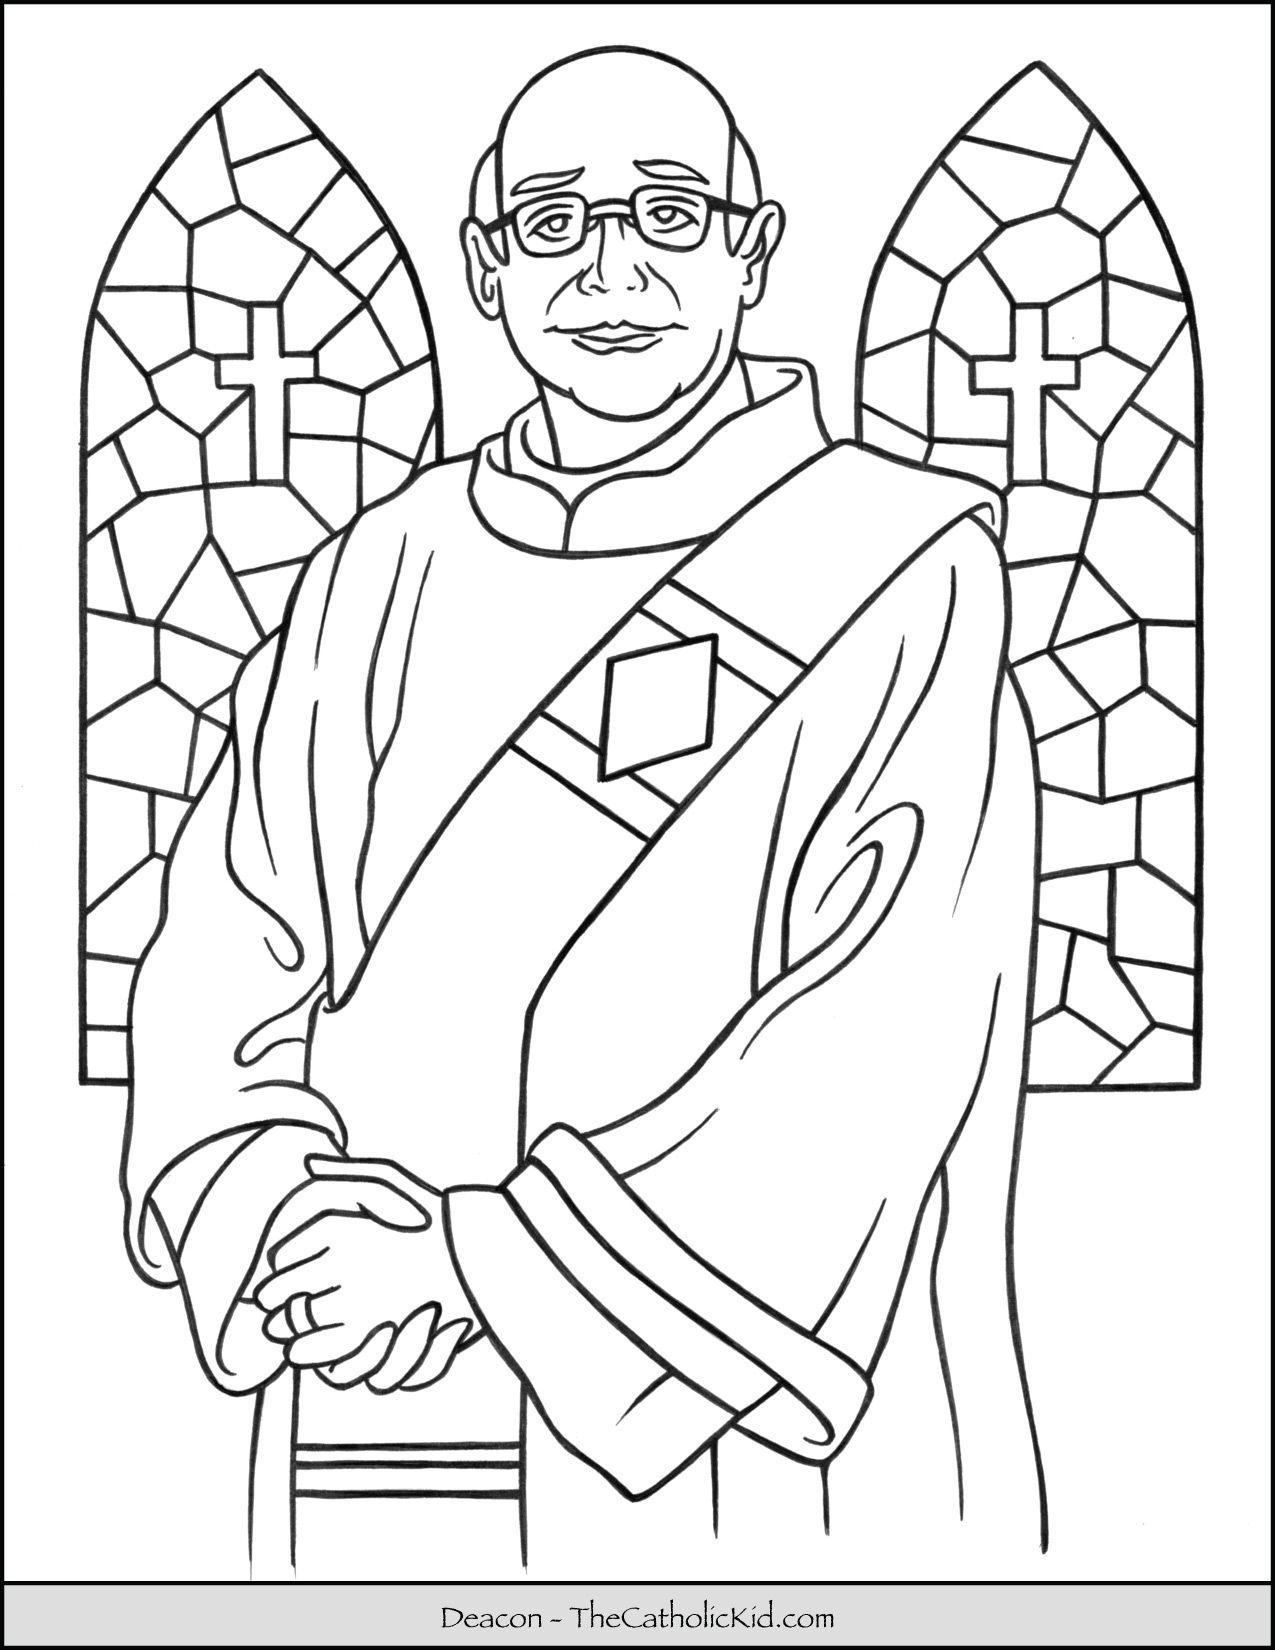 Catholic Deacon Coloring Page Thecatholickid Com Catholic